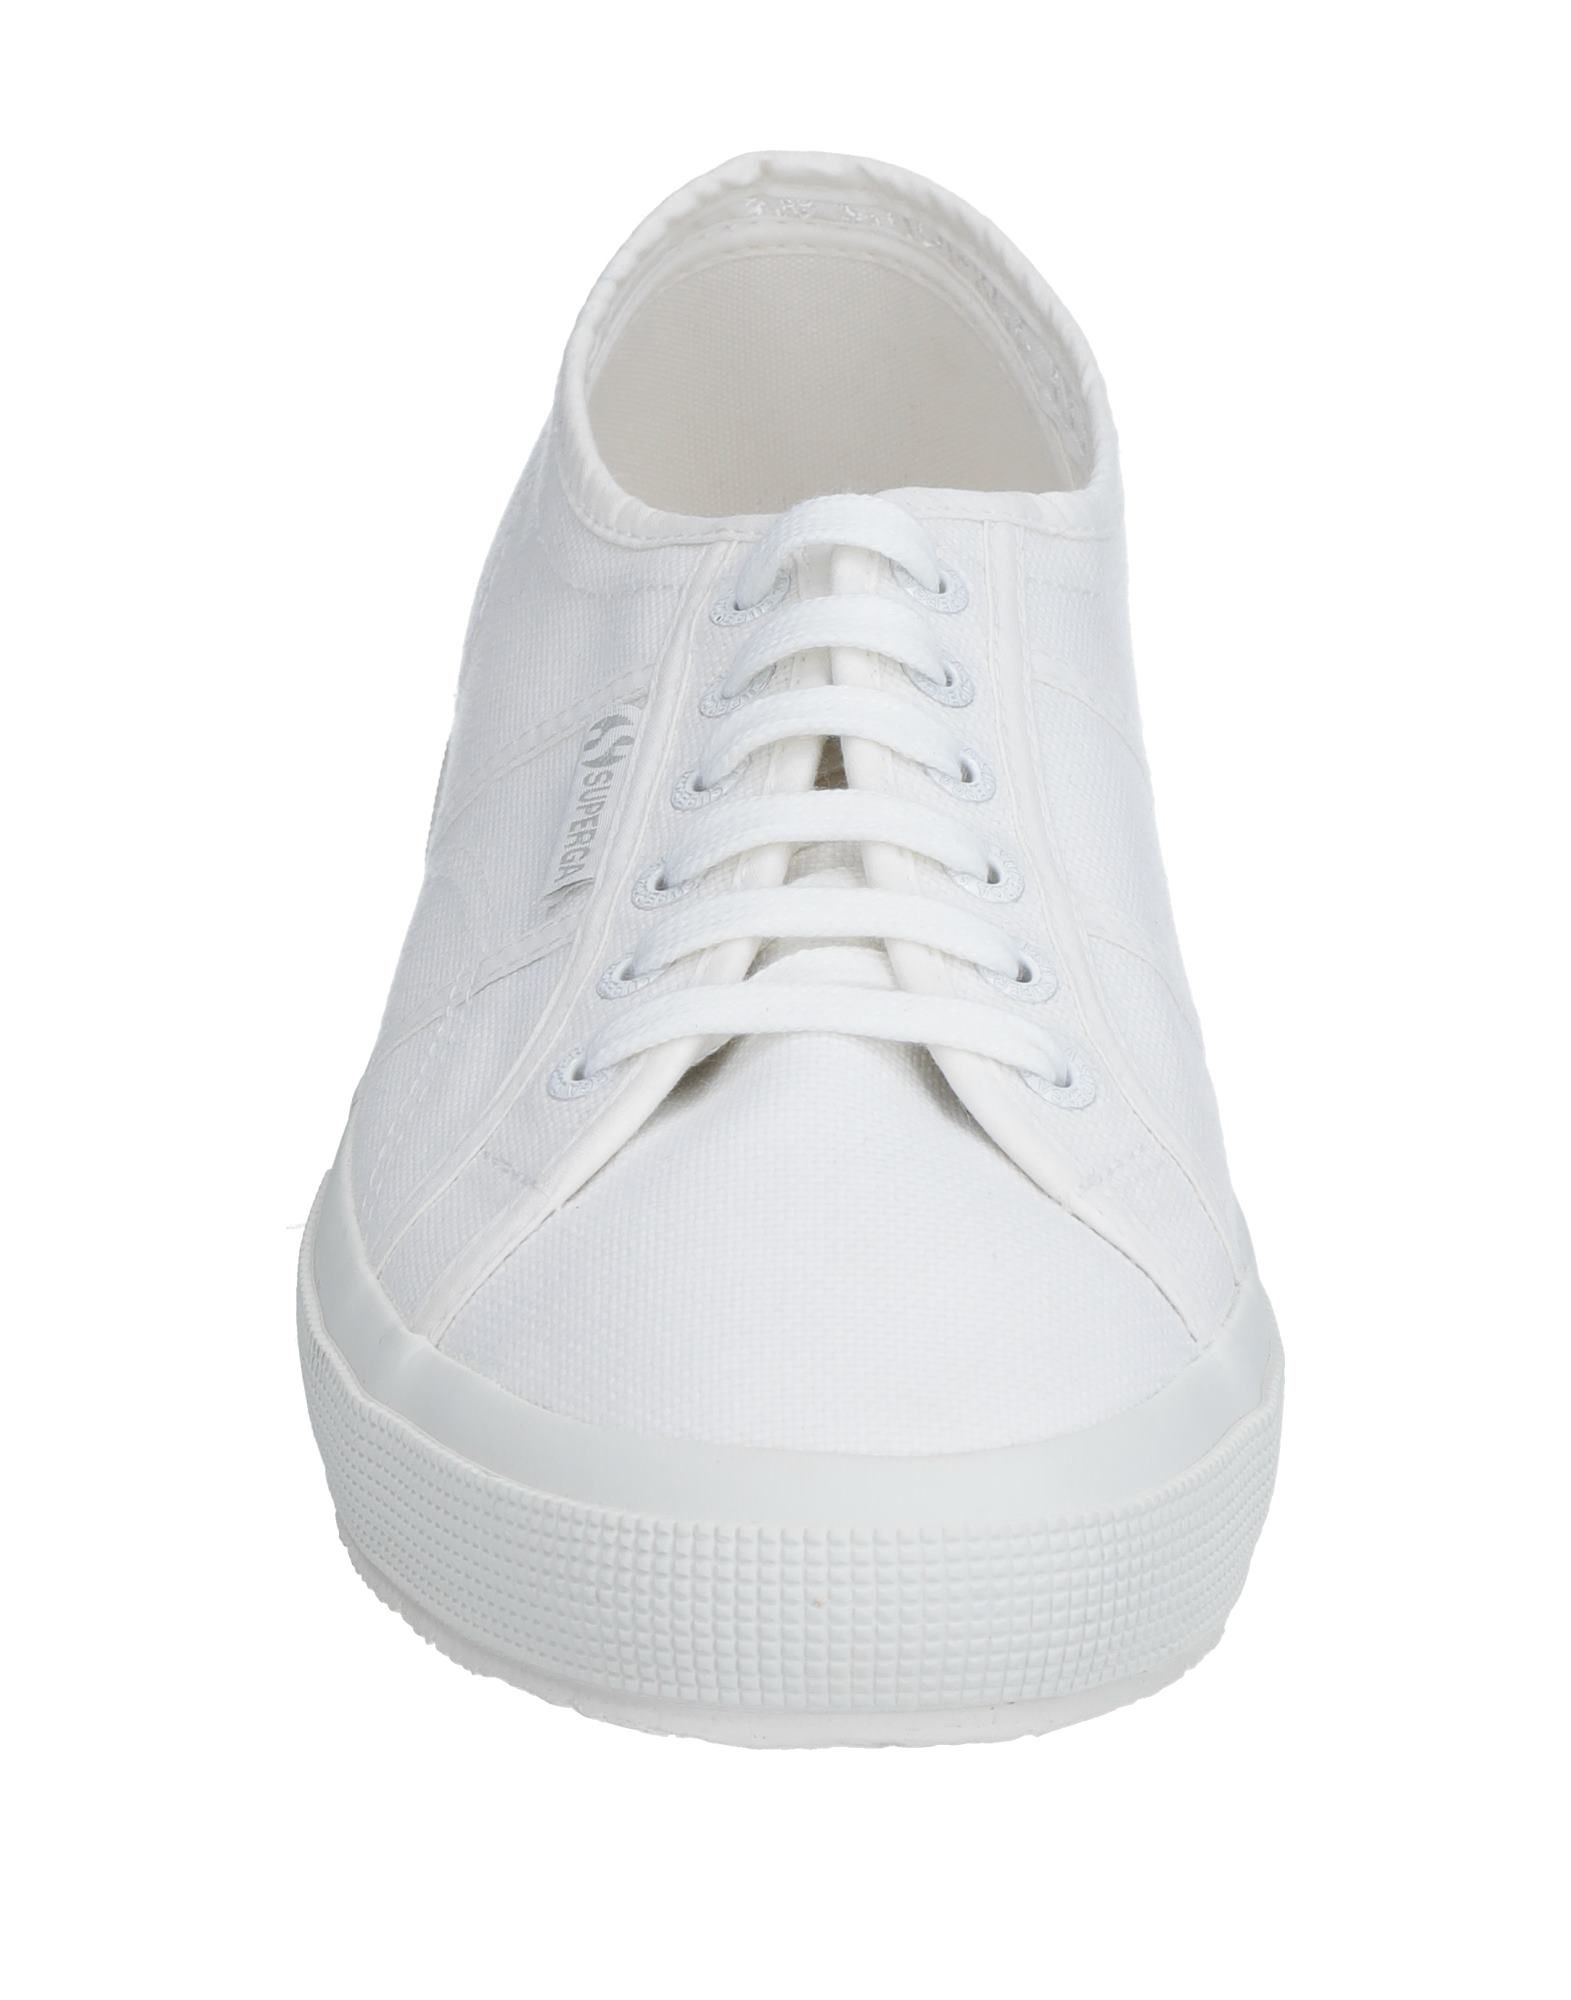 Rabatt echte Turnschuhes Schuhe Superga® Turnschuhes echte Herren 11329136MB e07437